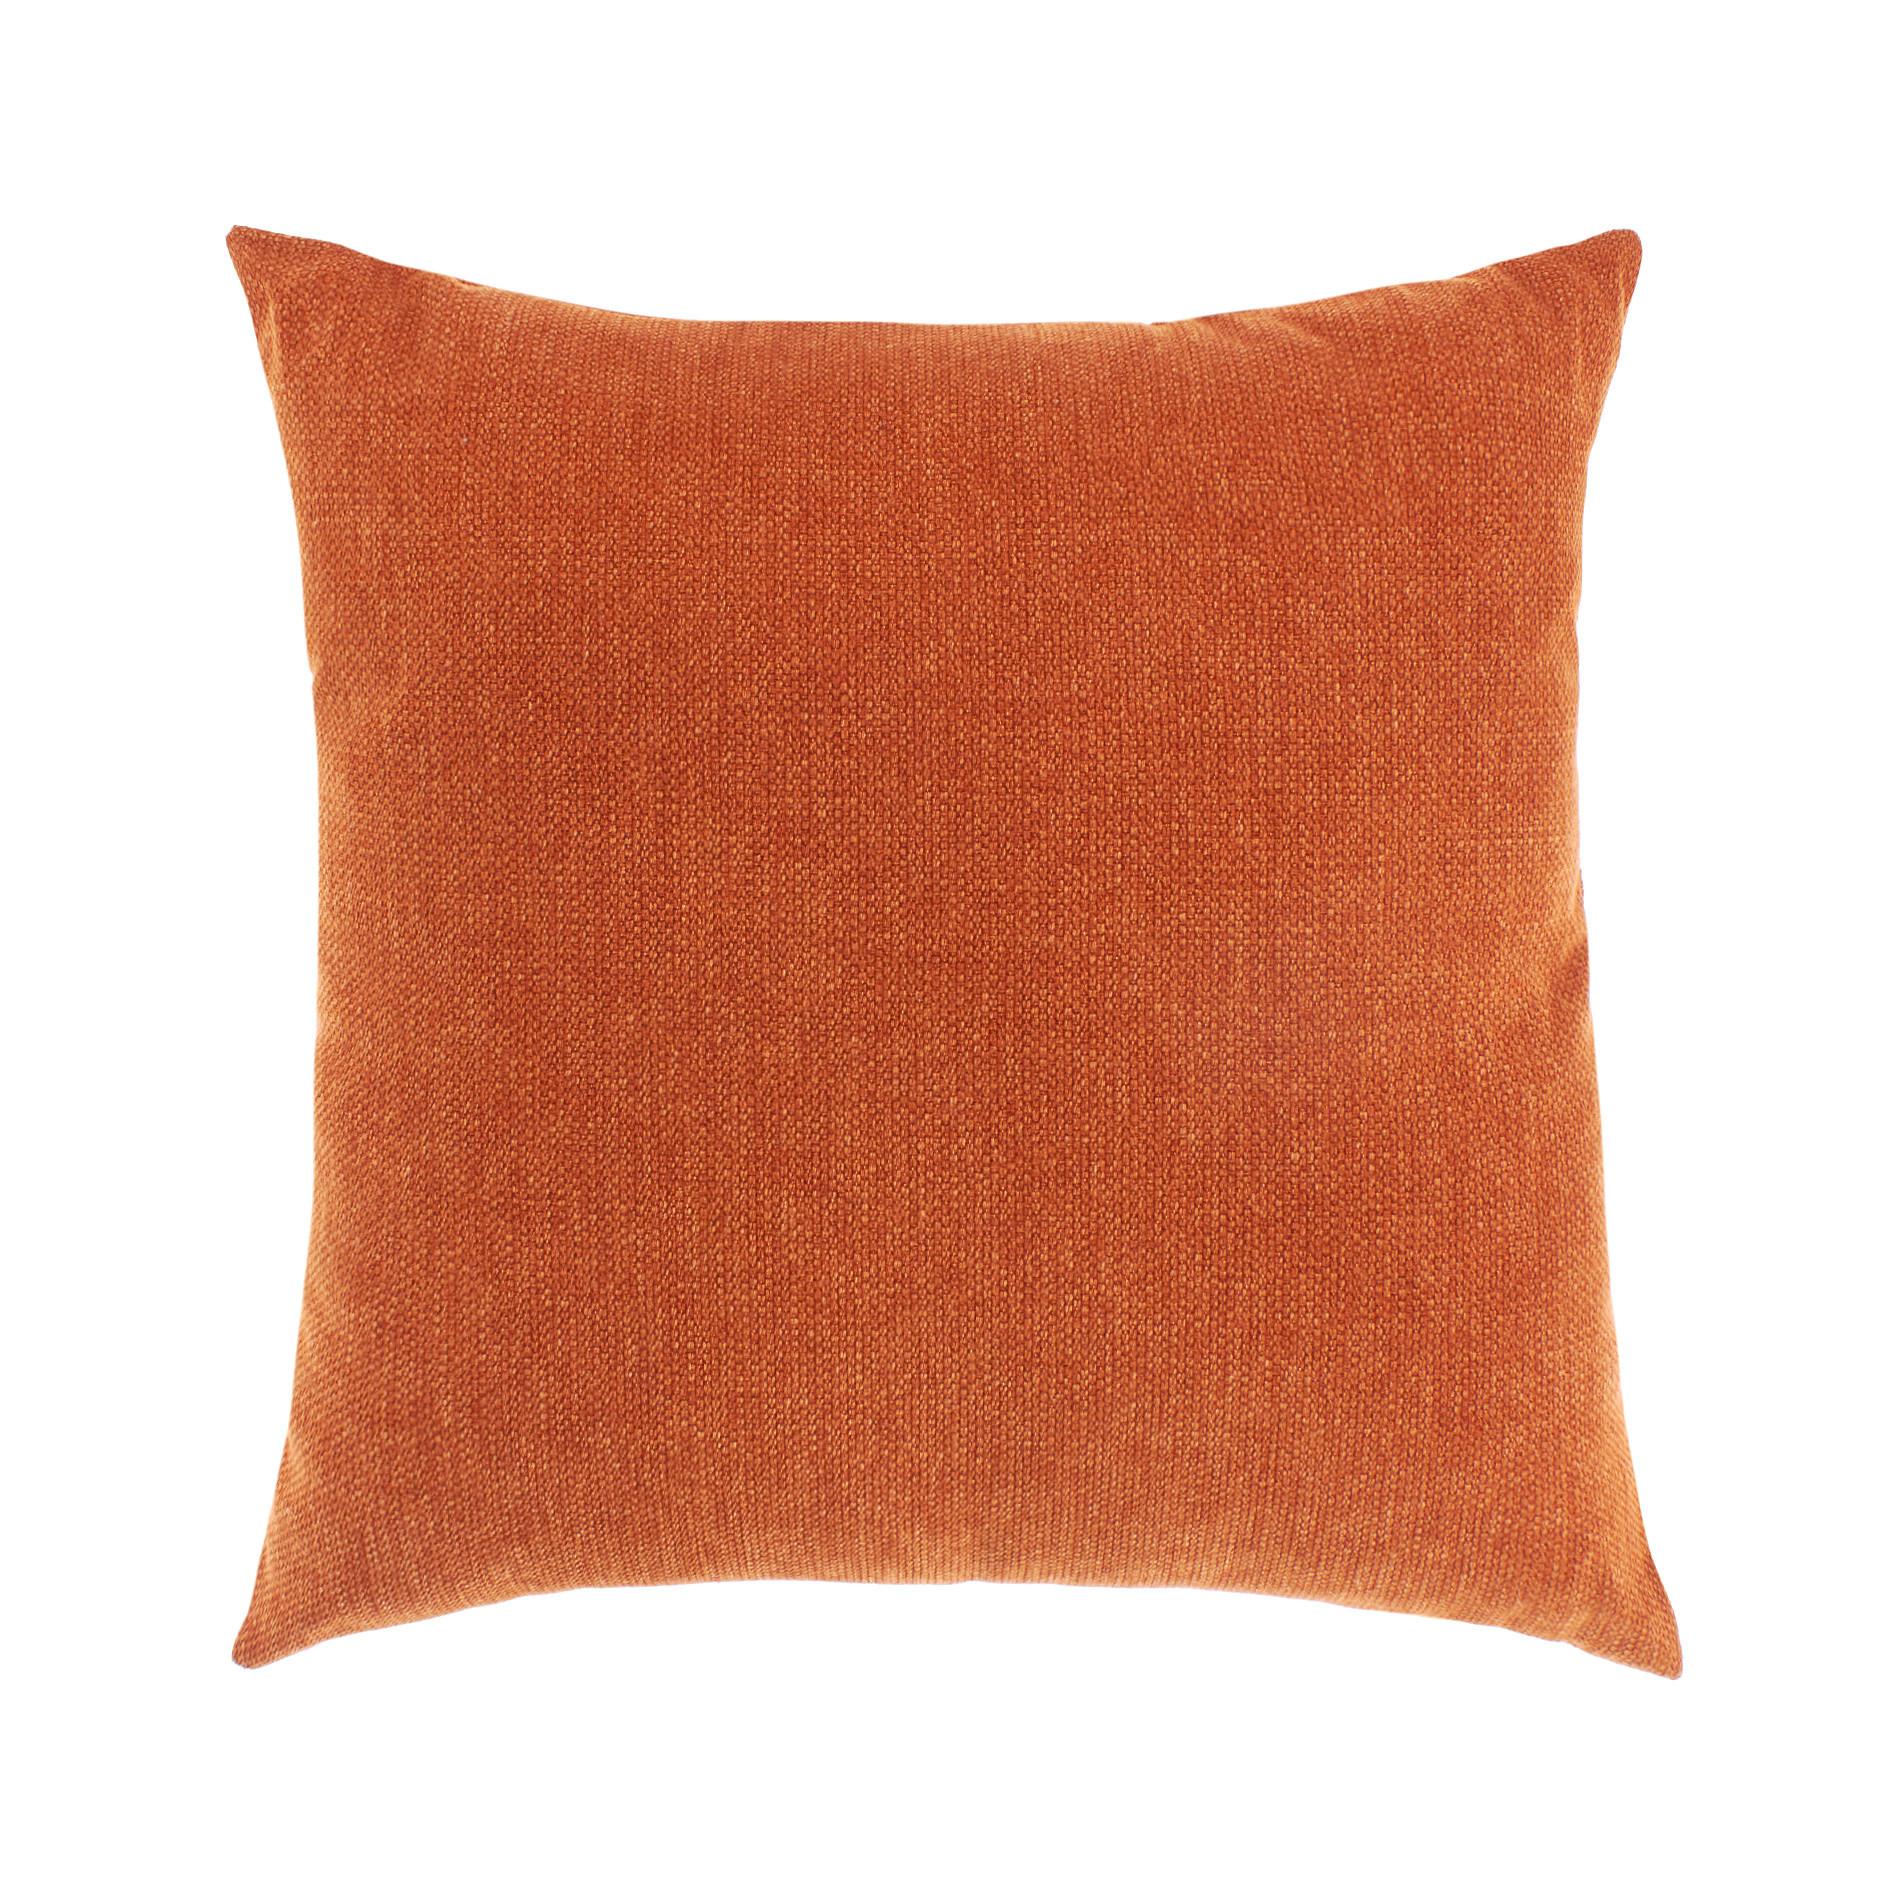 Cuscino tinta unita effetto sfumato, Arancione scuro, large image number 0